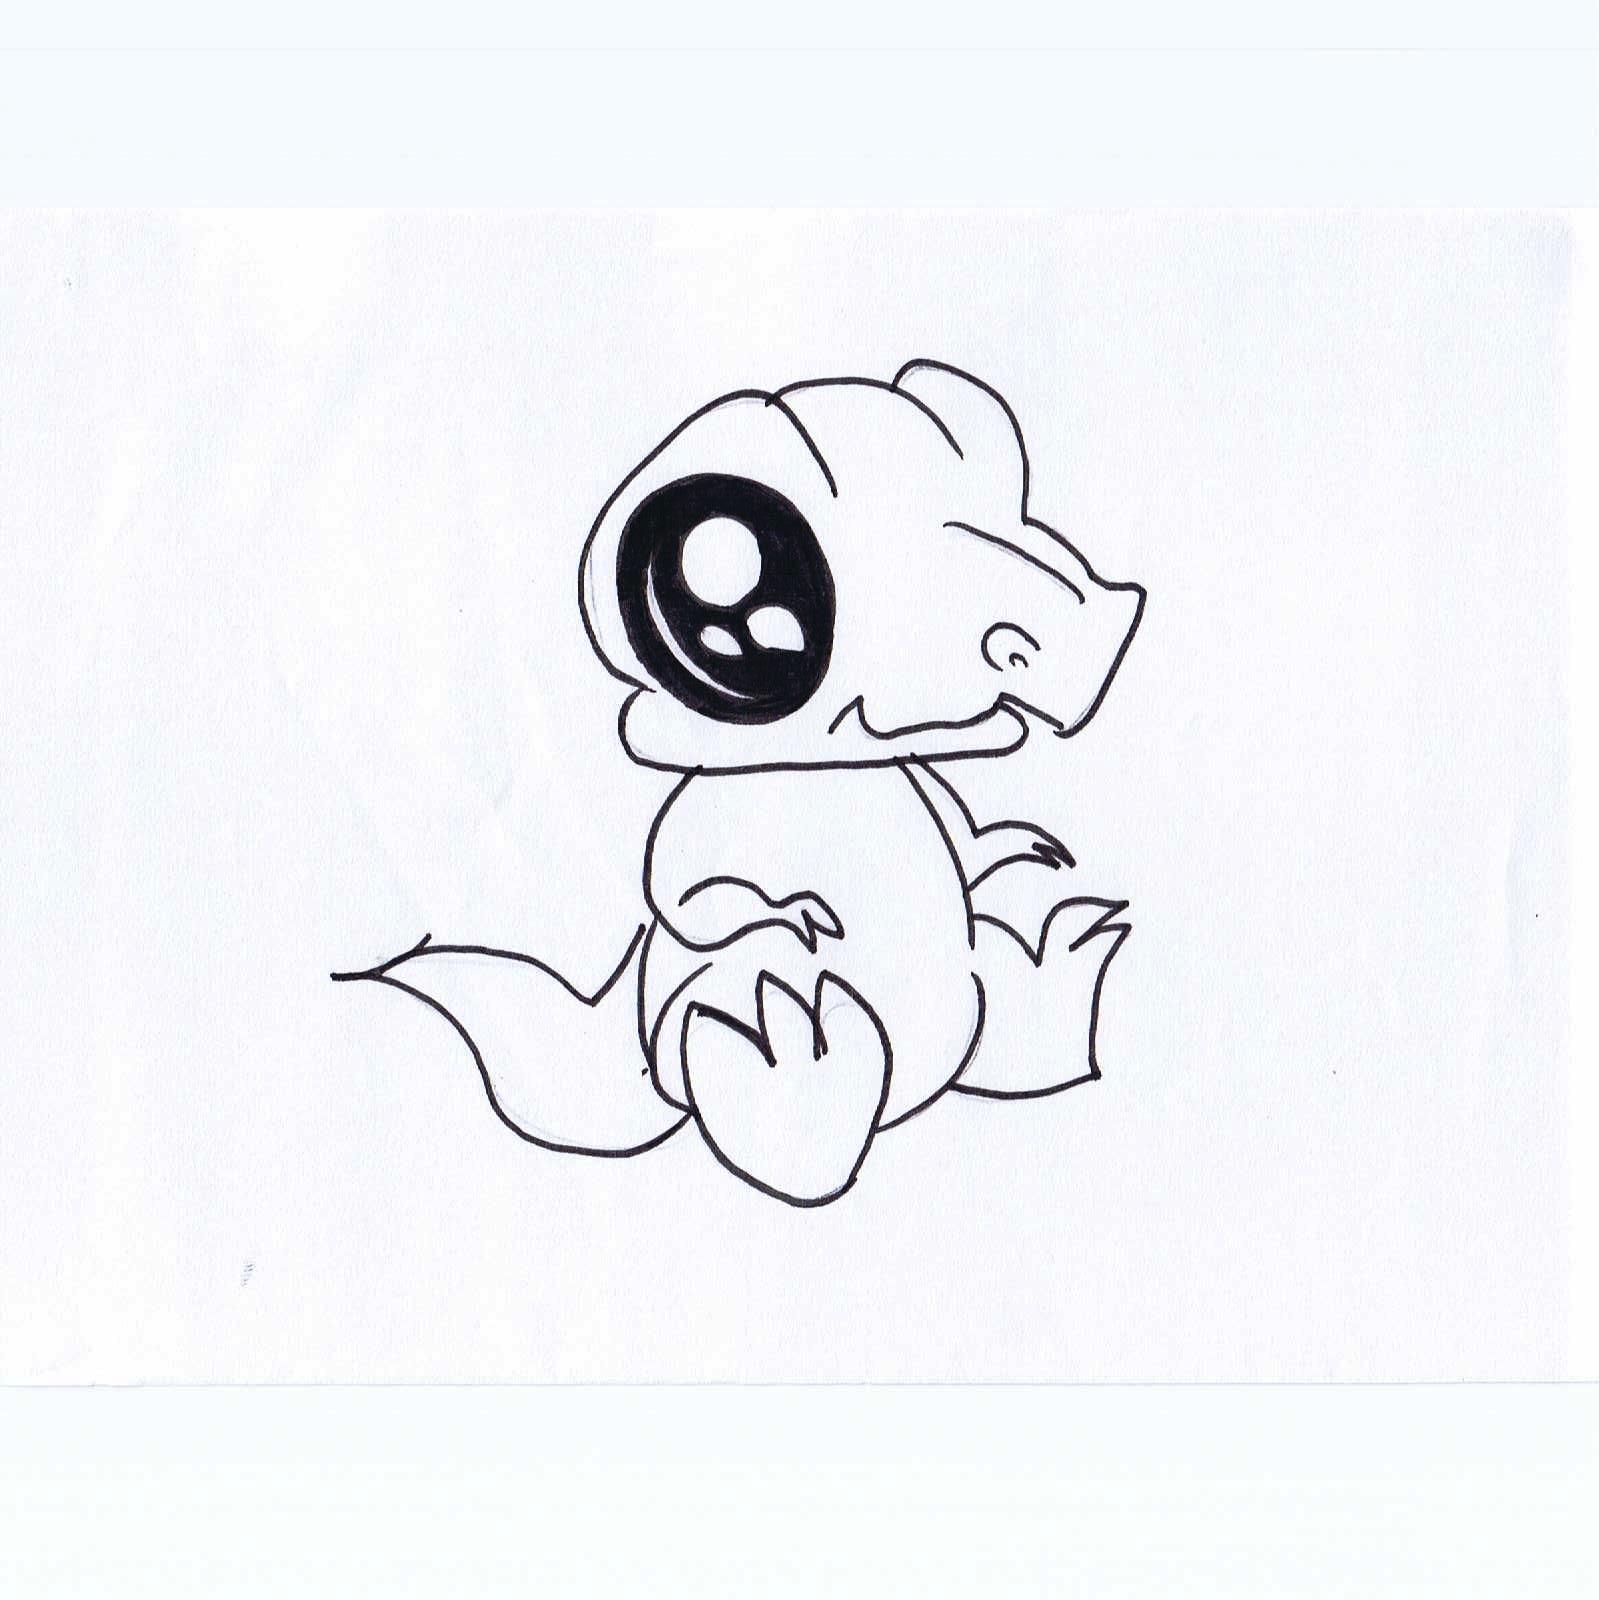 eyes cartoon drawing at getdrawings com free for personal use eyes